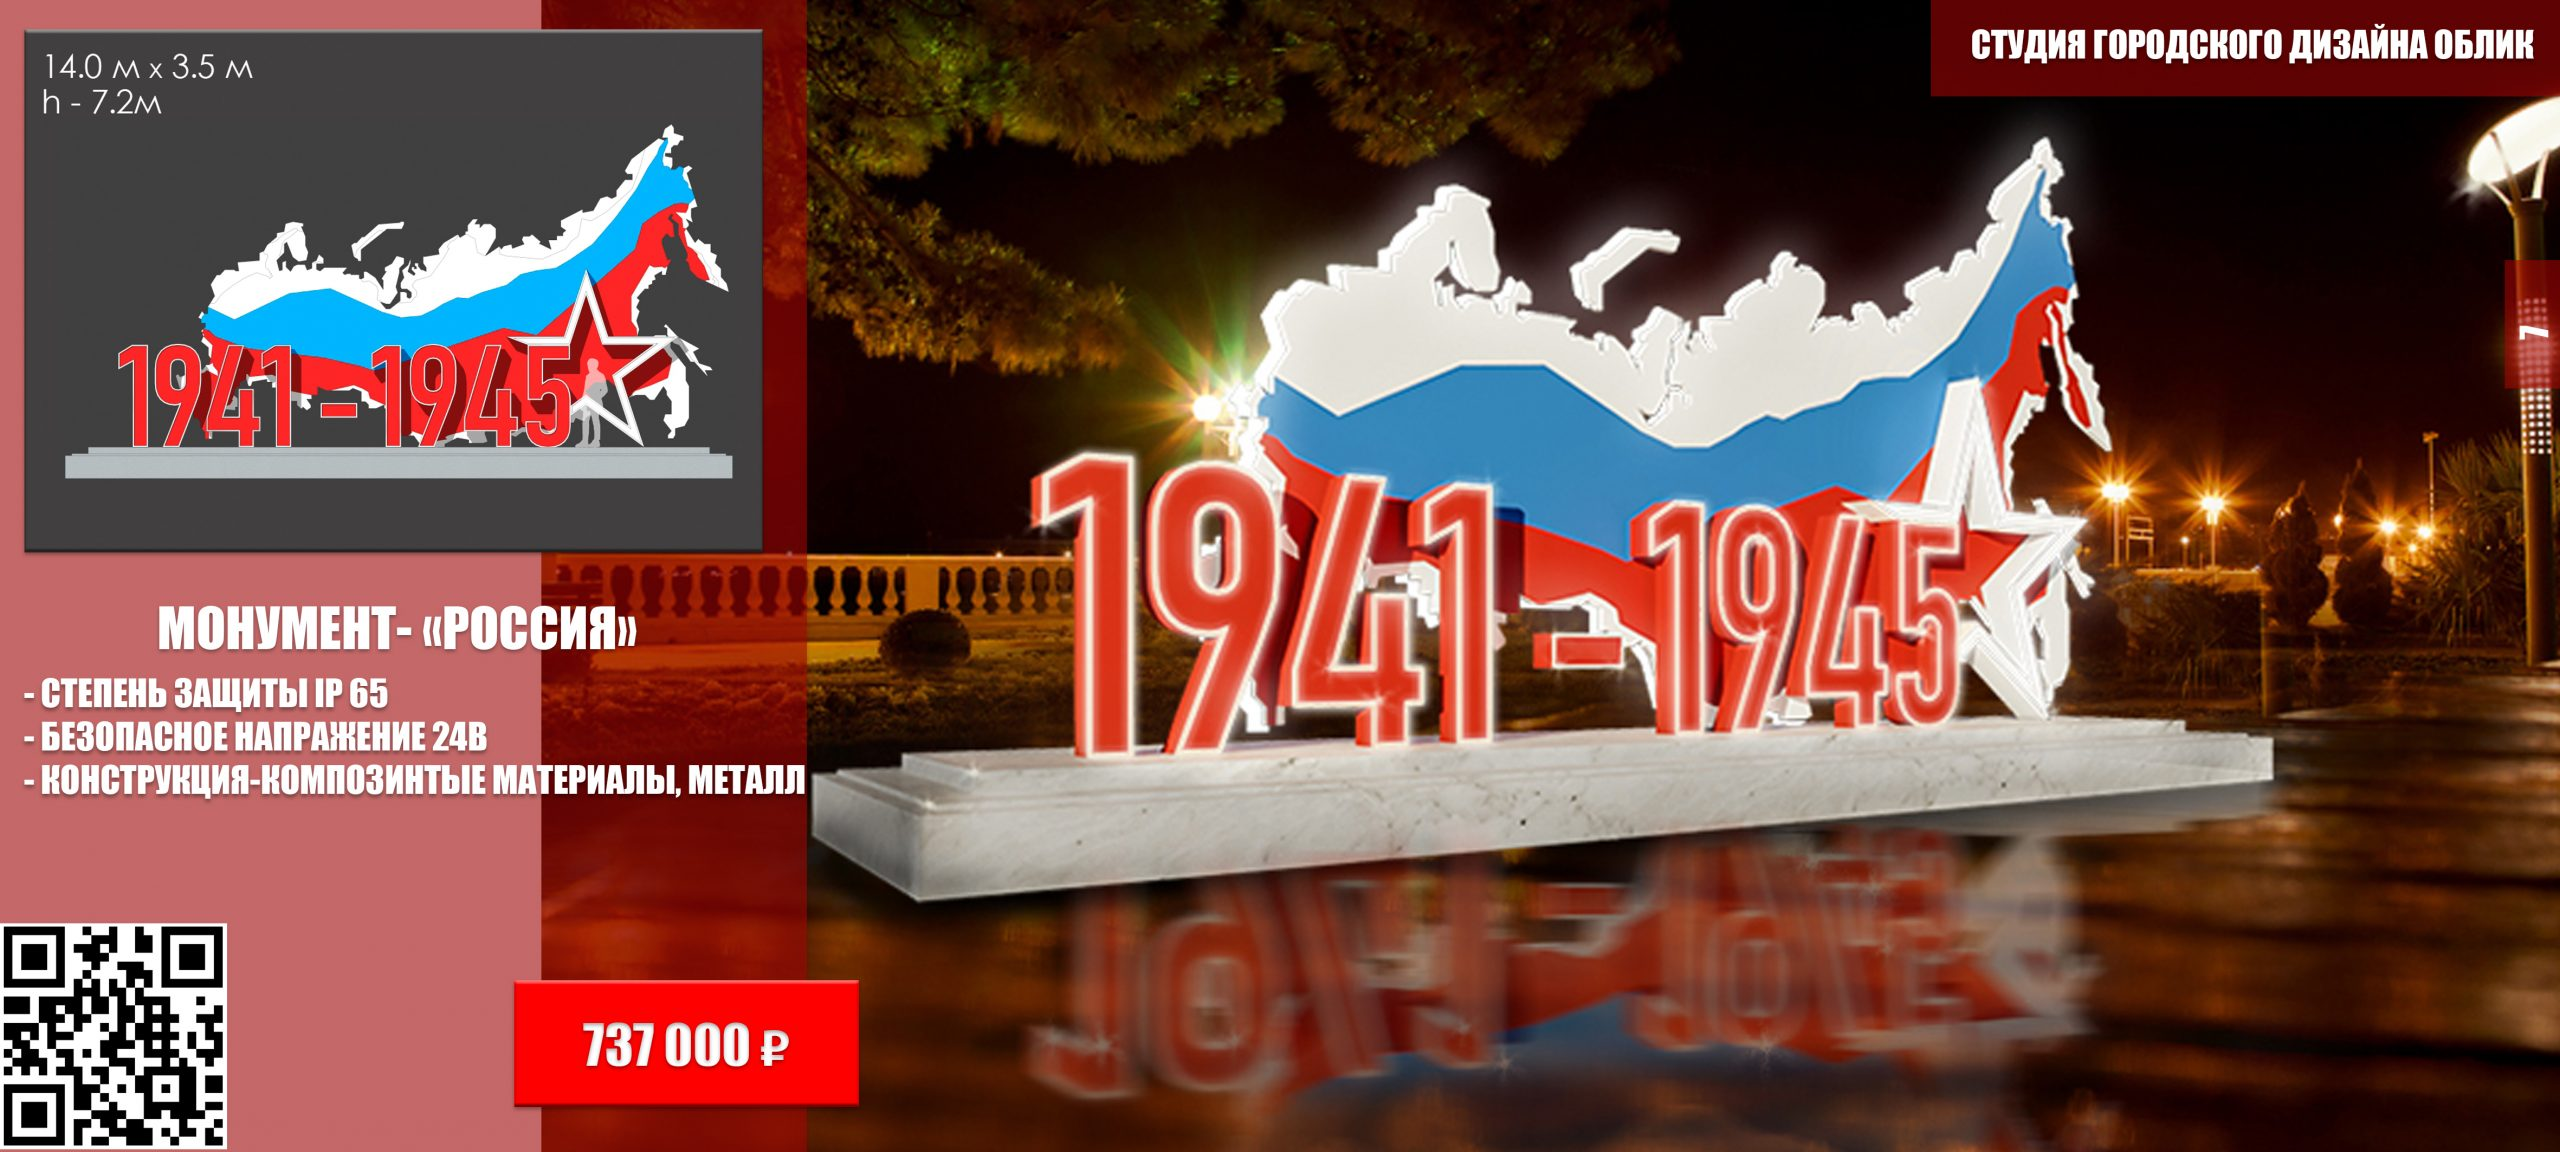 Монумент 1941-1945